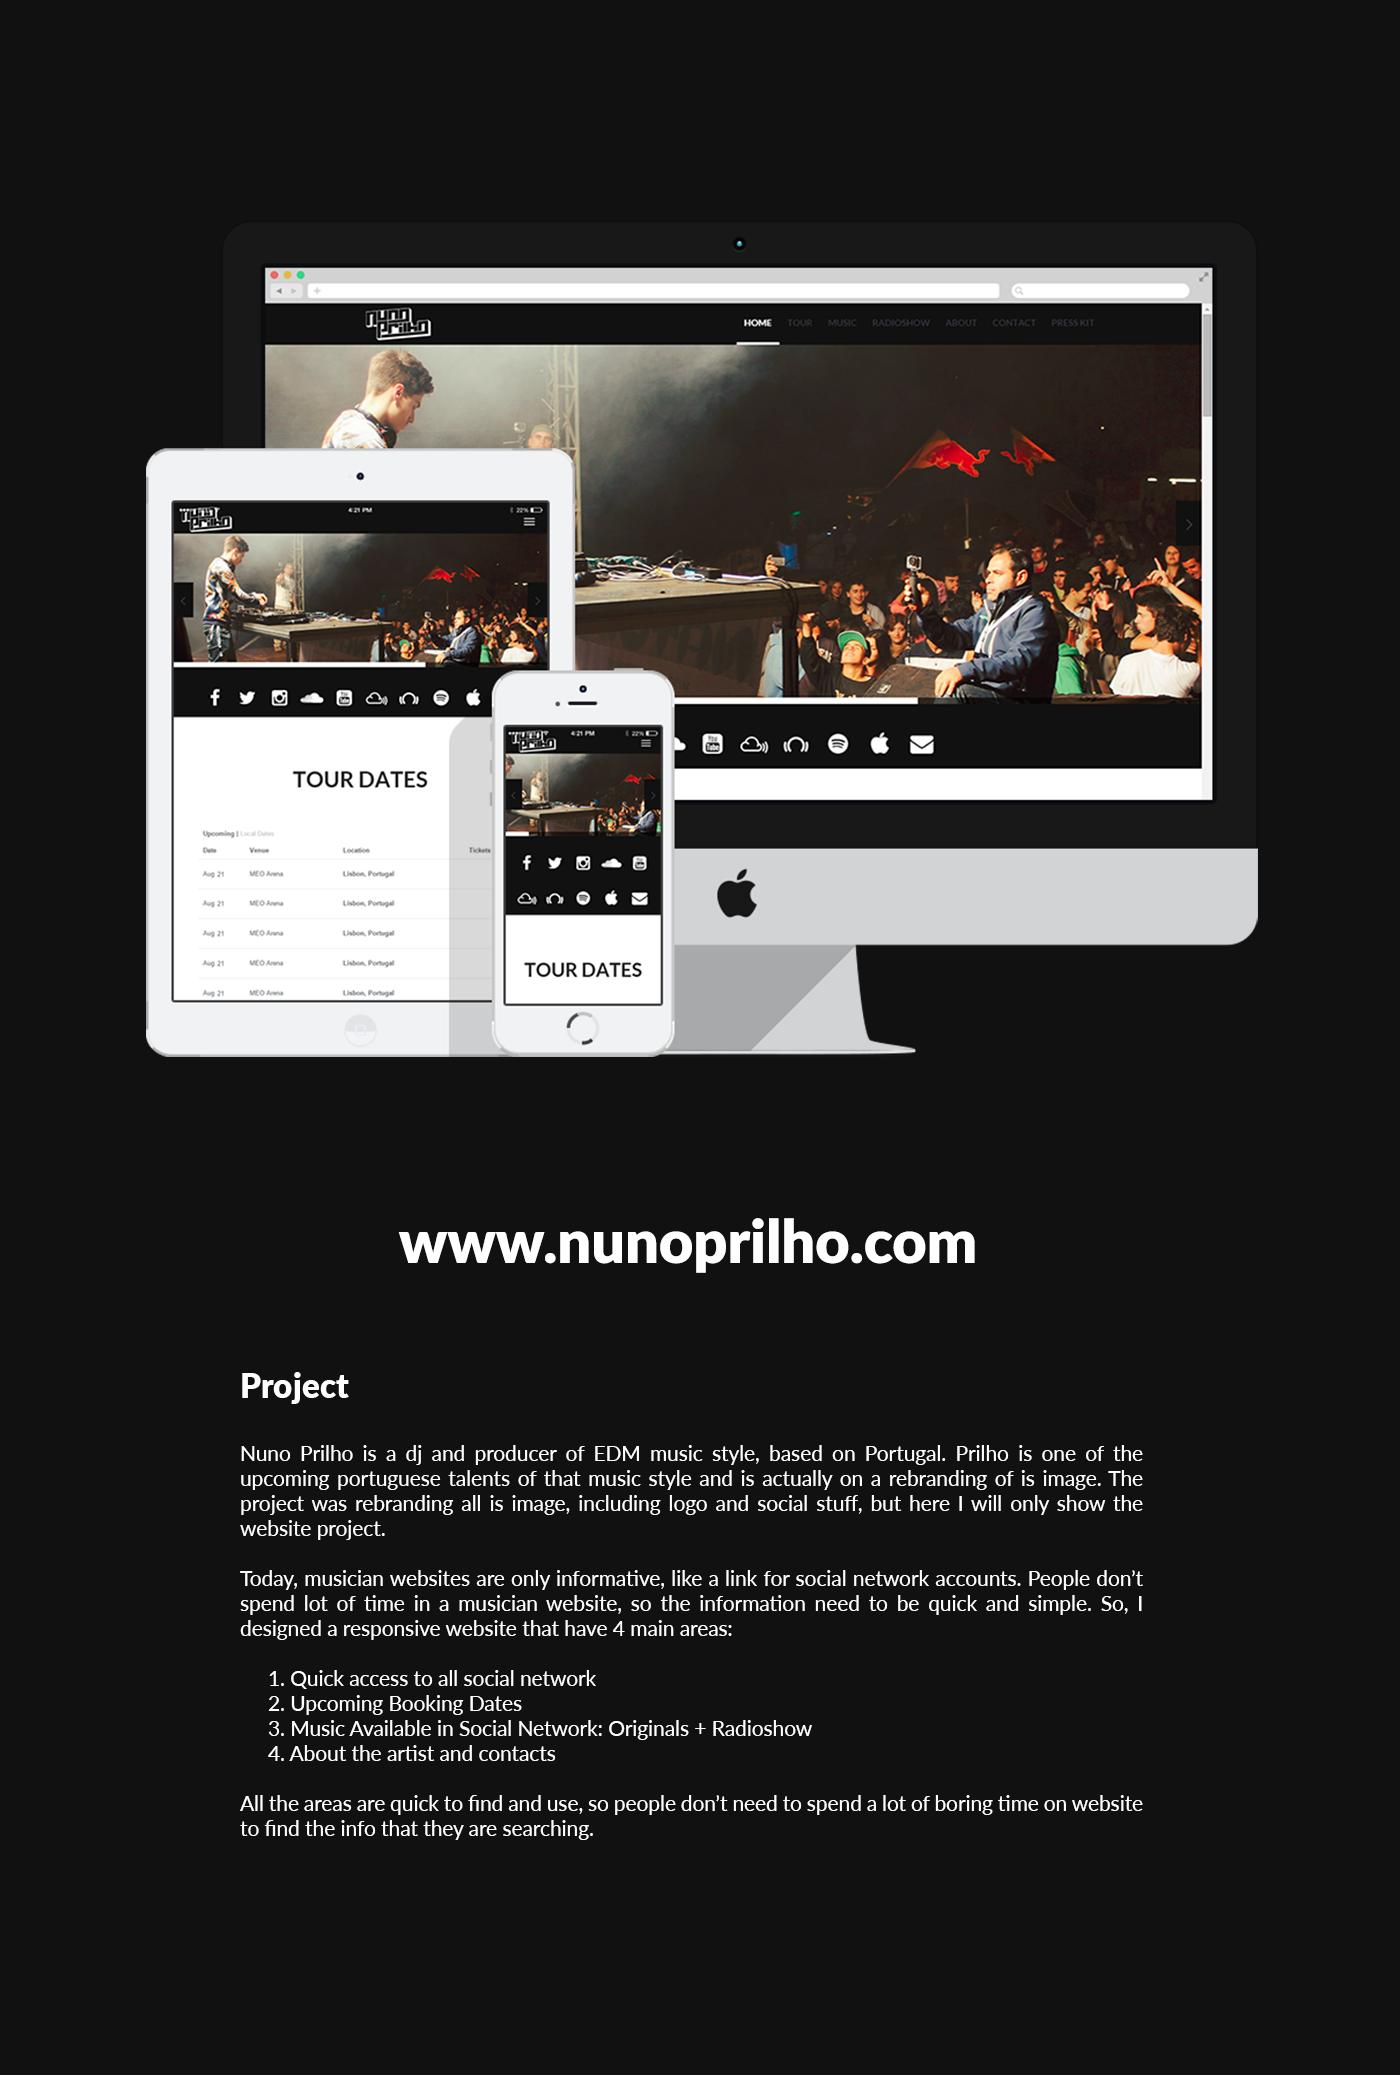 Responsive,dj,Website,Web,producer,Nuno Prilho,edm,web interface